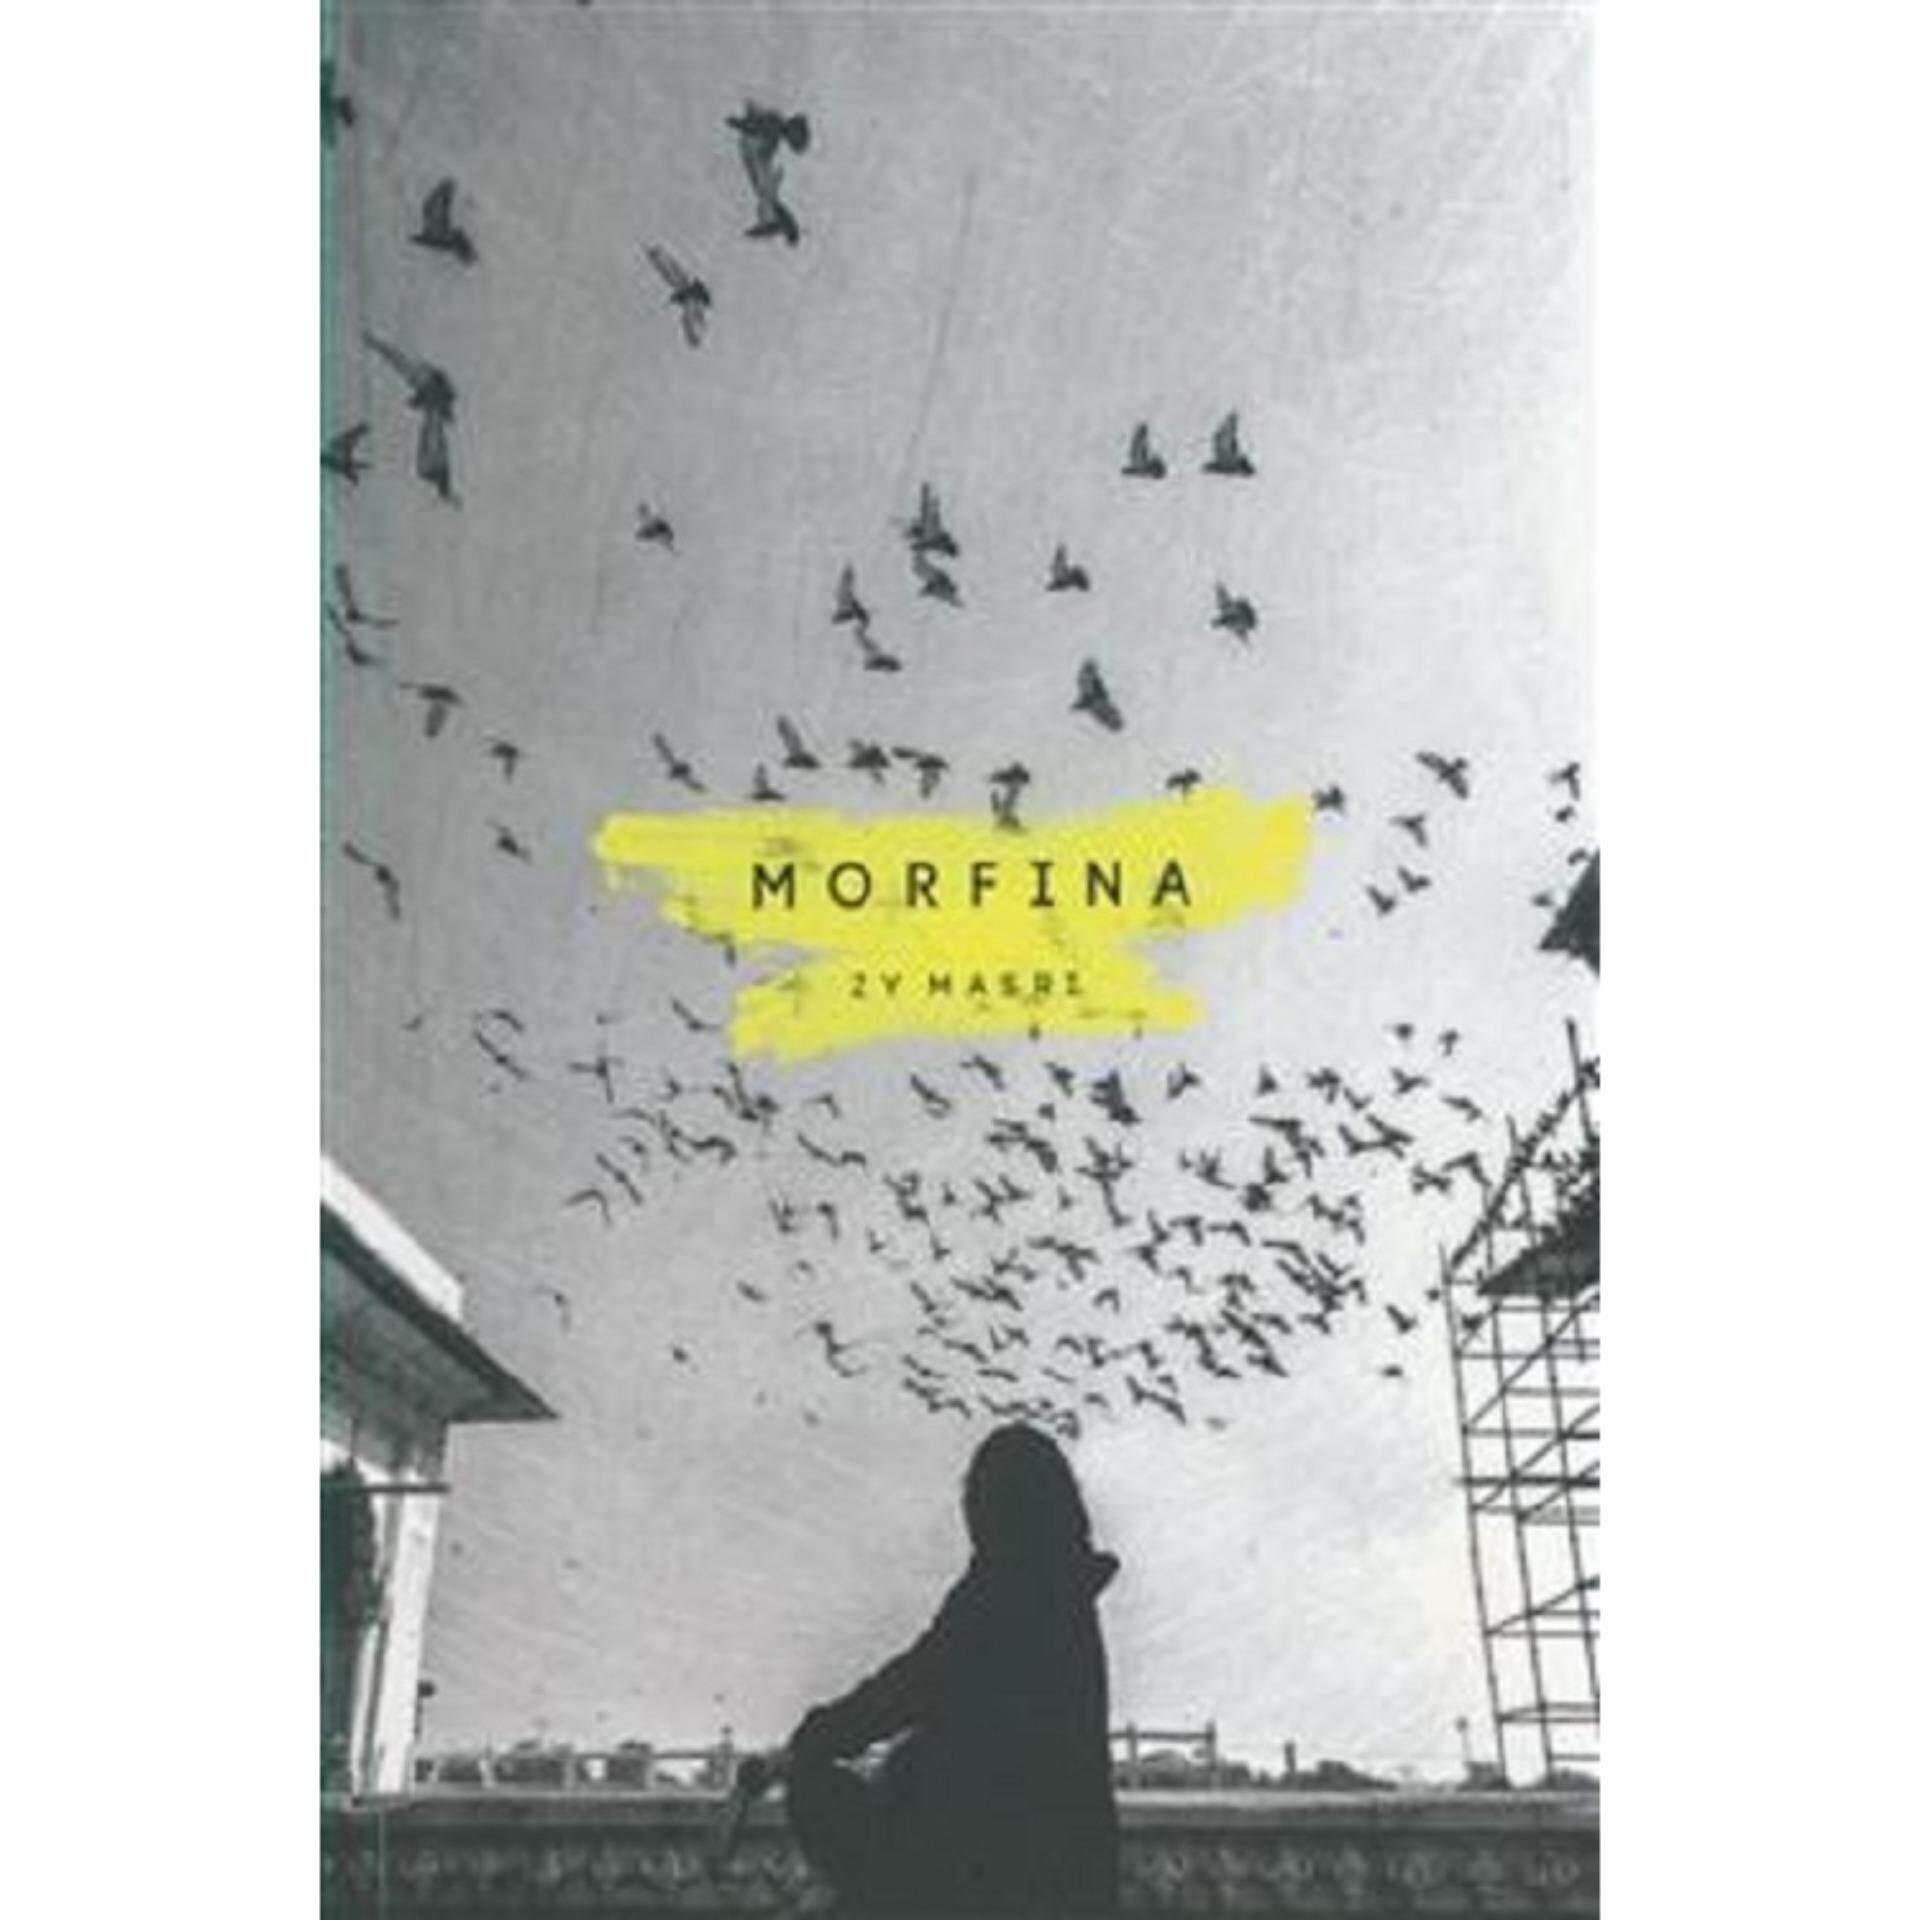 Morfina - ISBN : 9789671307335 Author Zy Masri